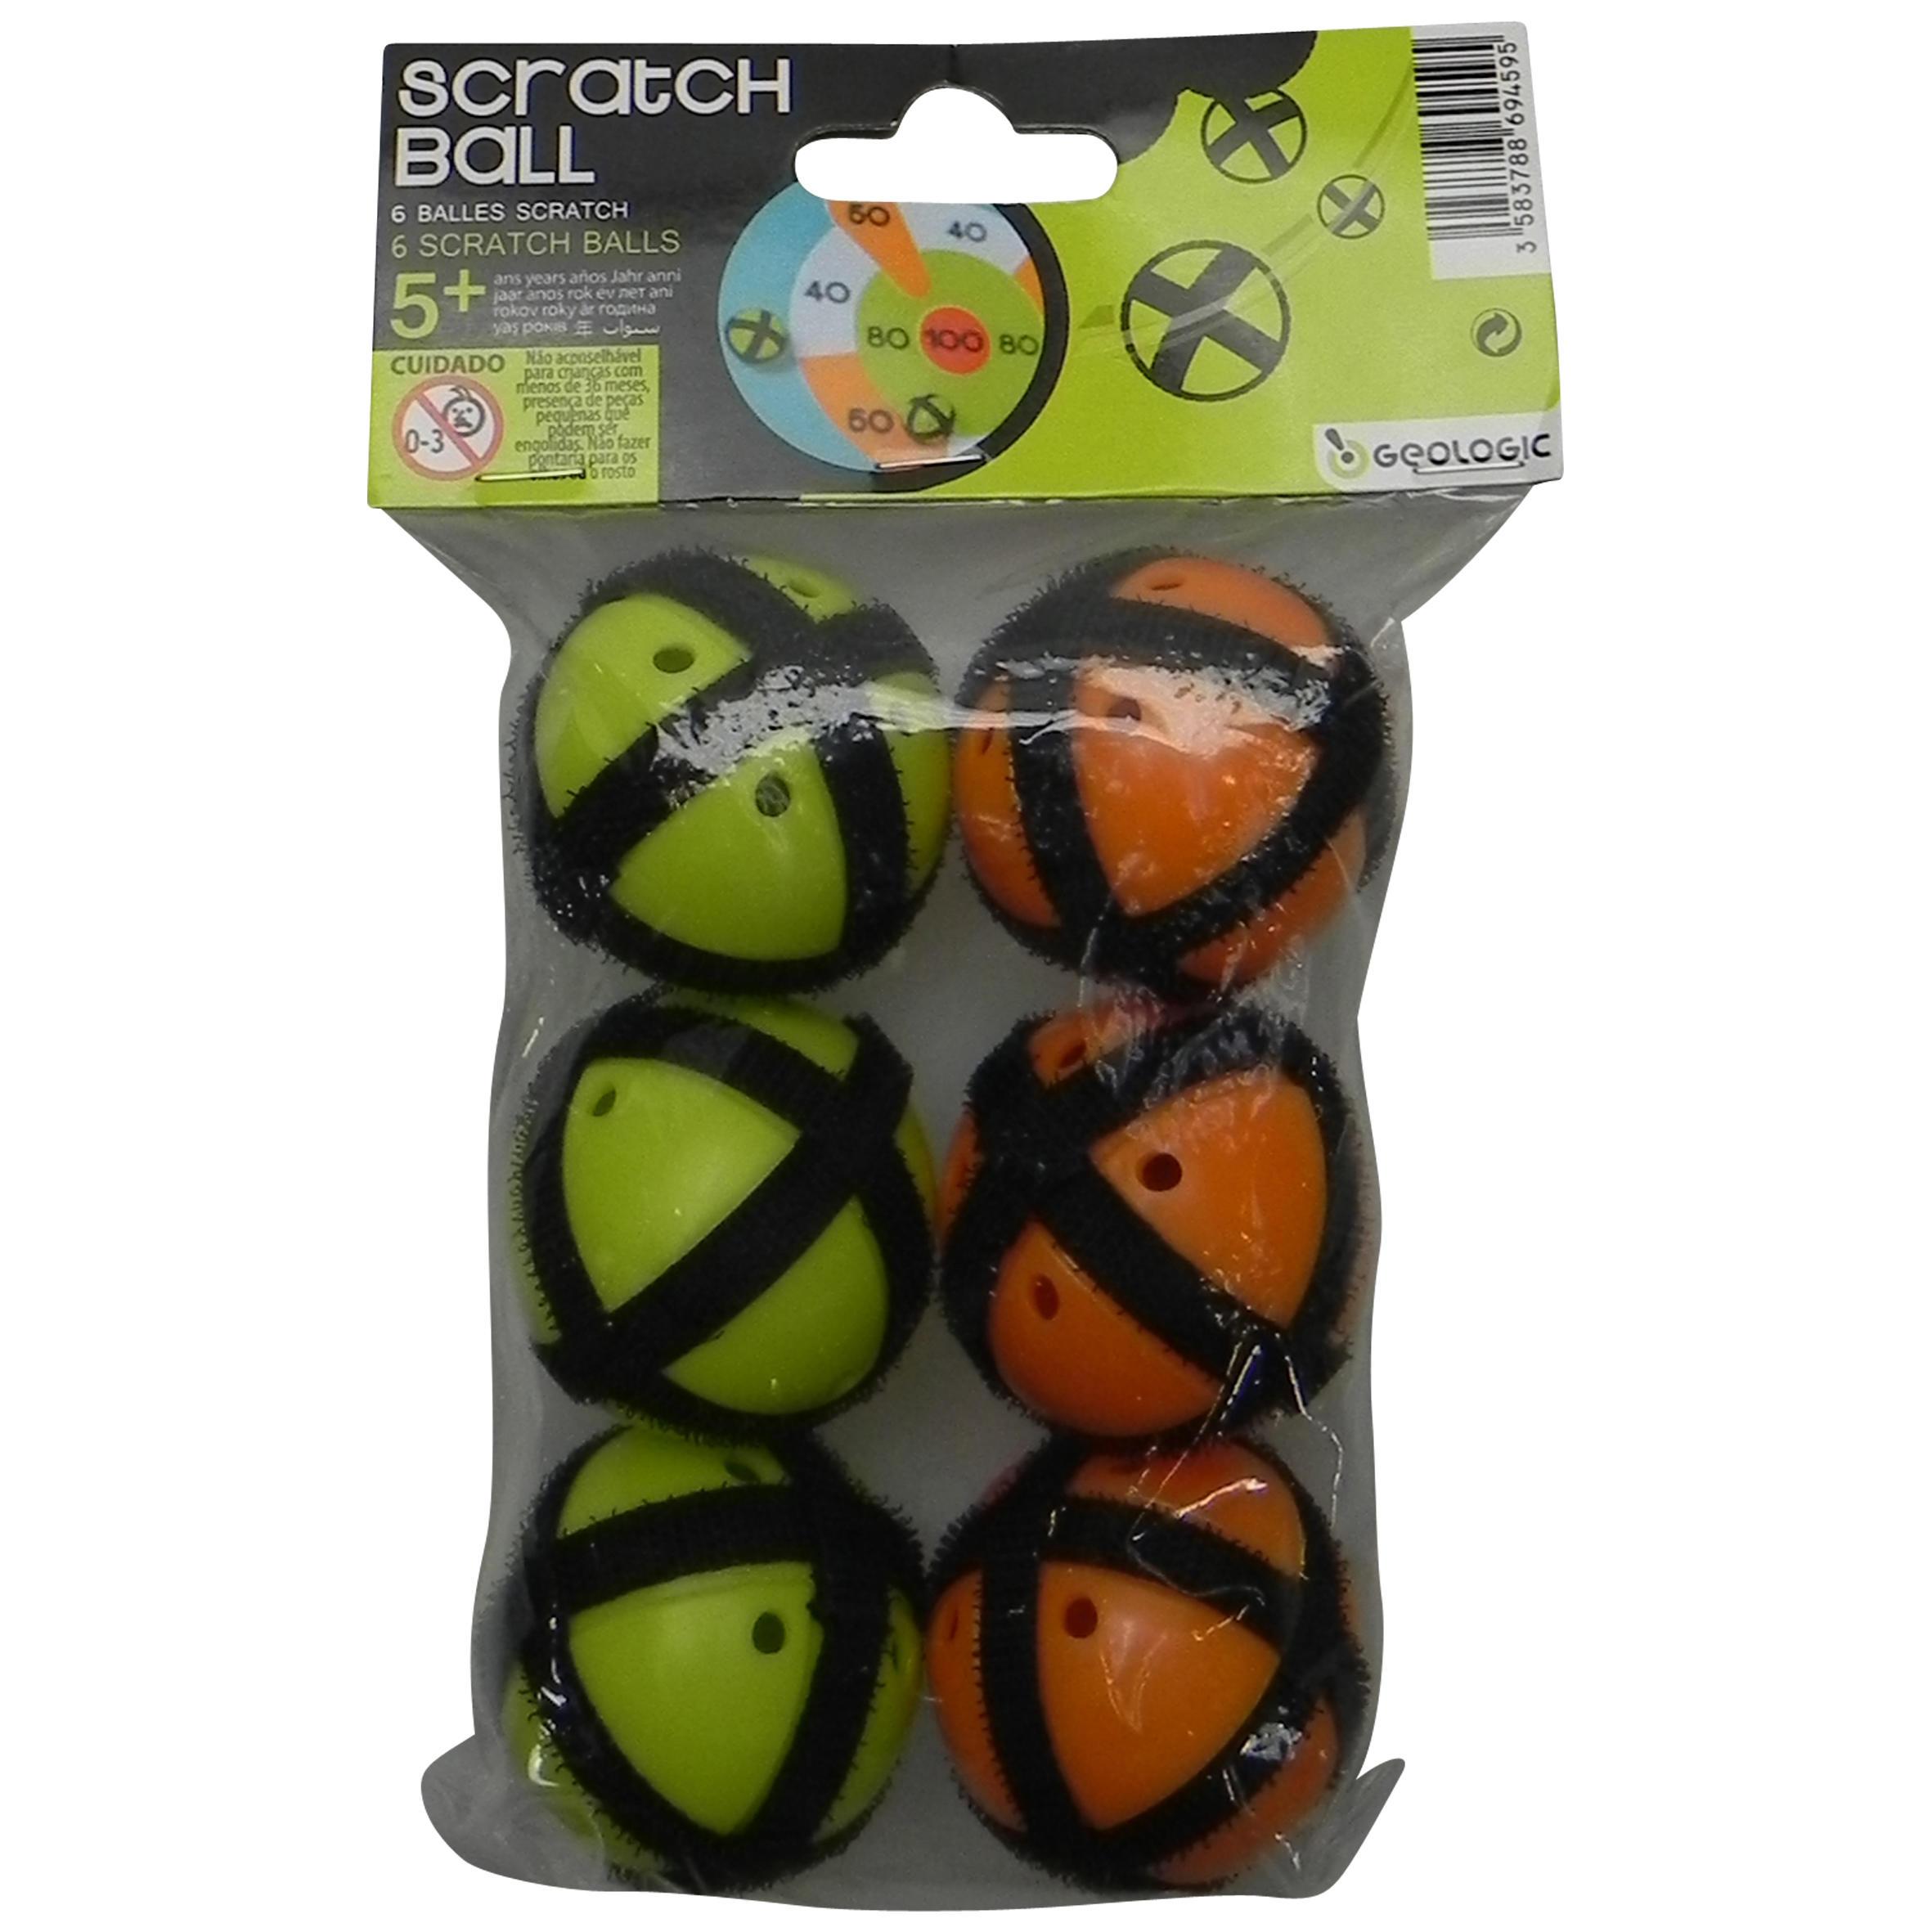 Velcro Target Balls